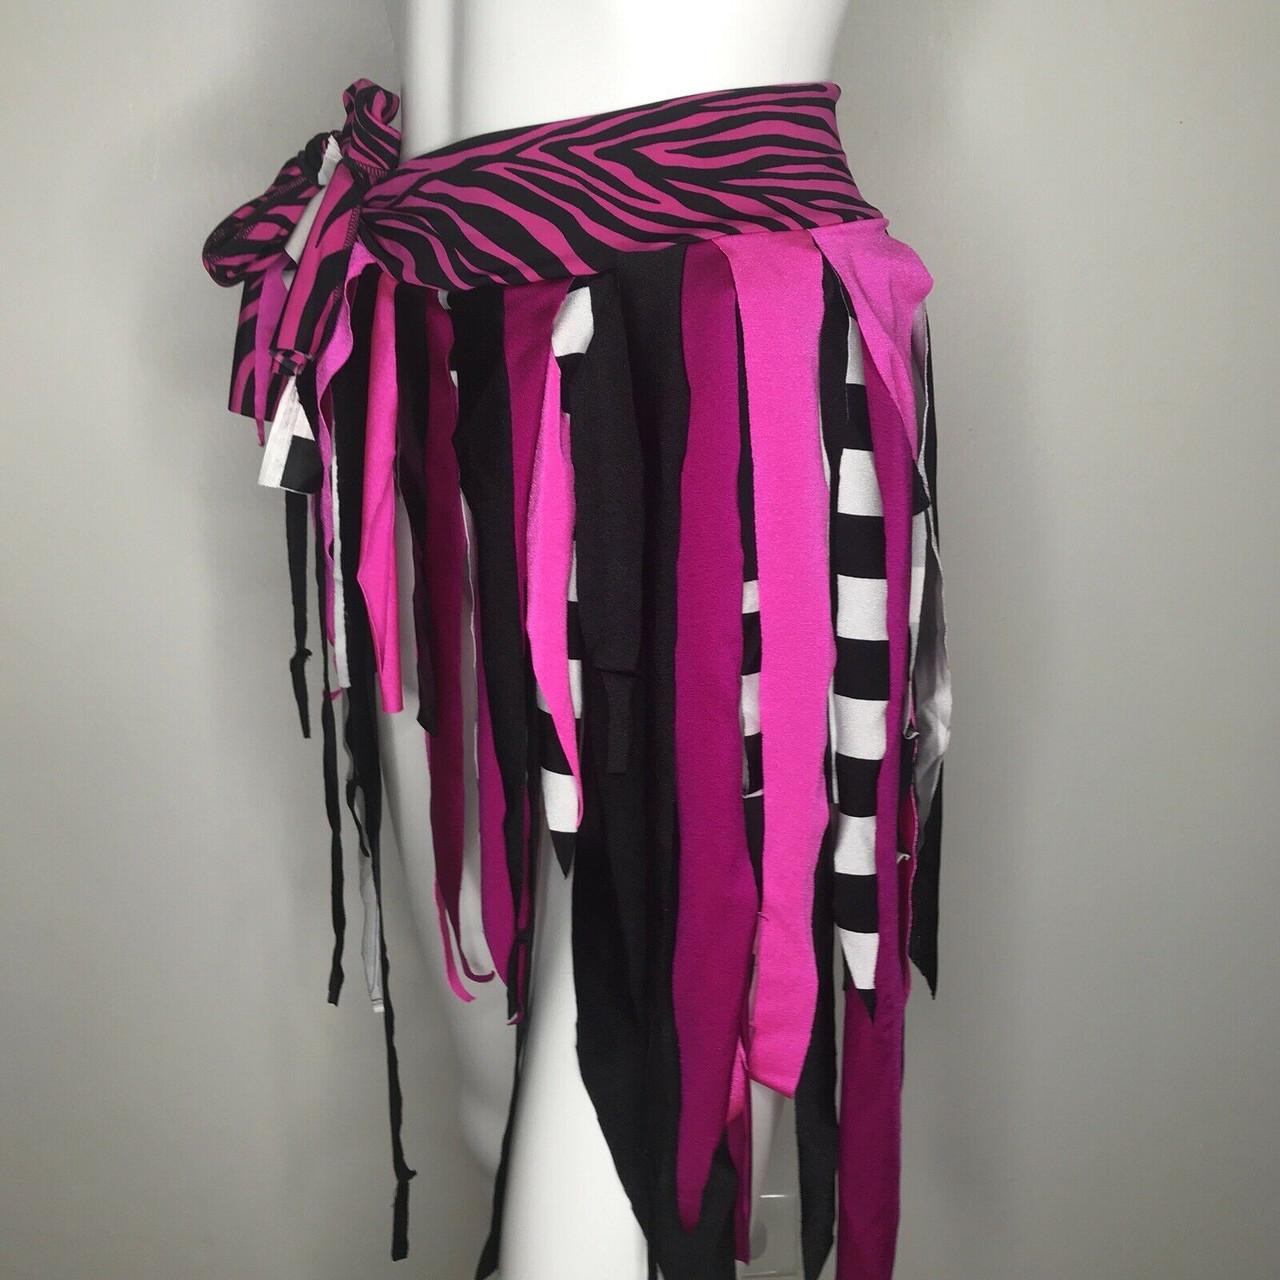 handmade White dance printed geometric pink and black skirt